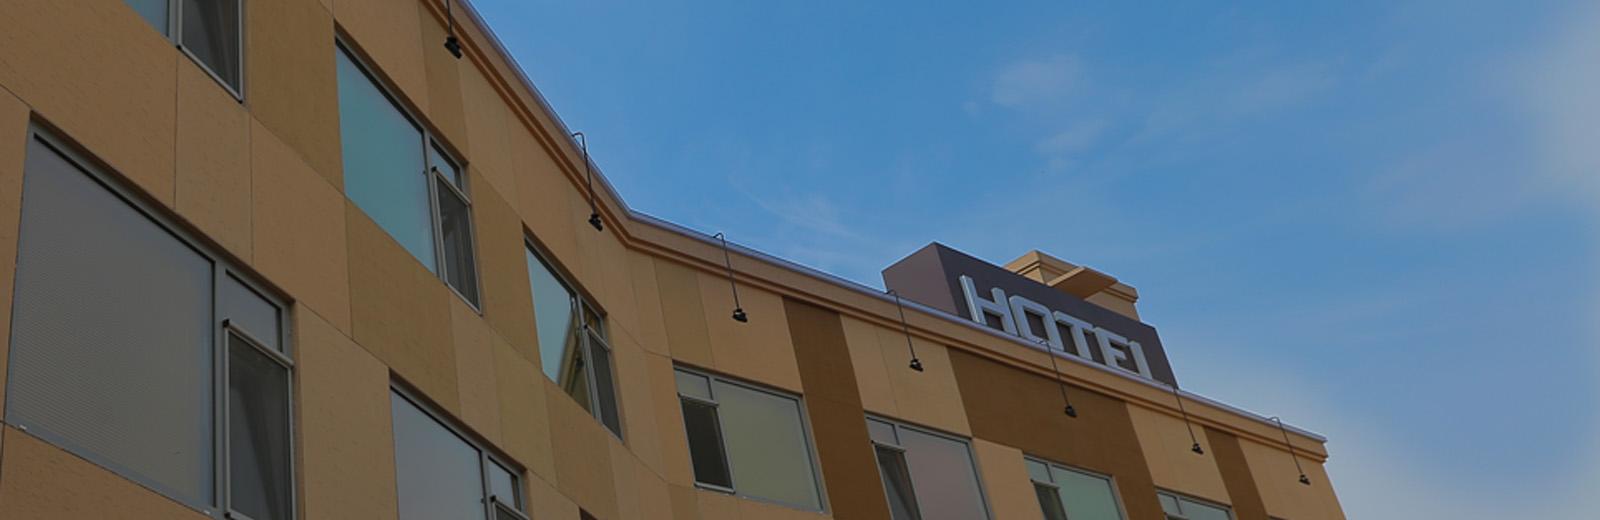 hotel_sky